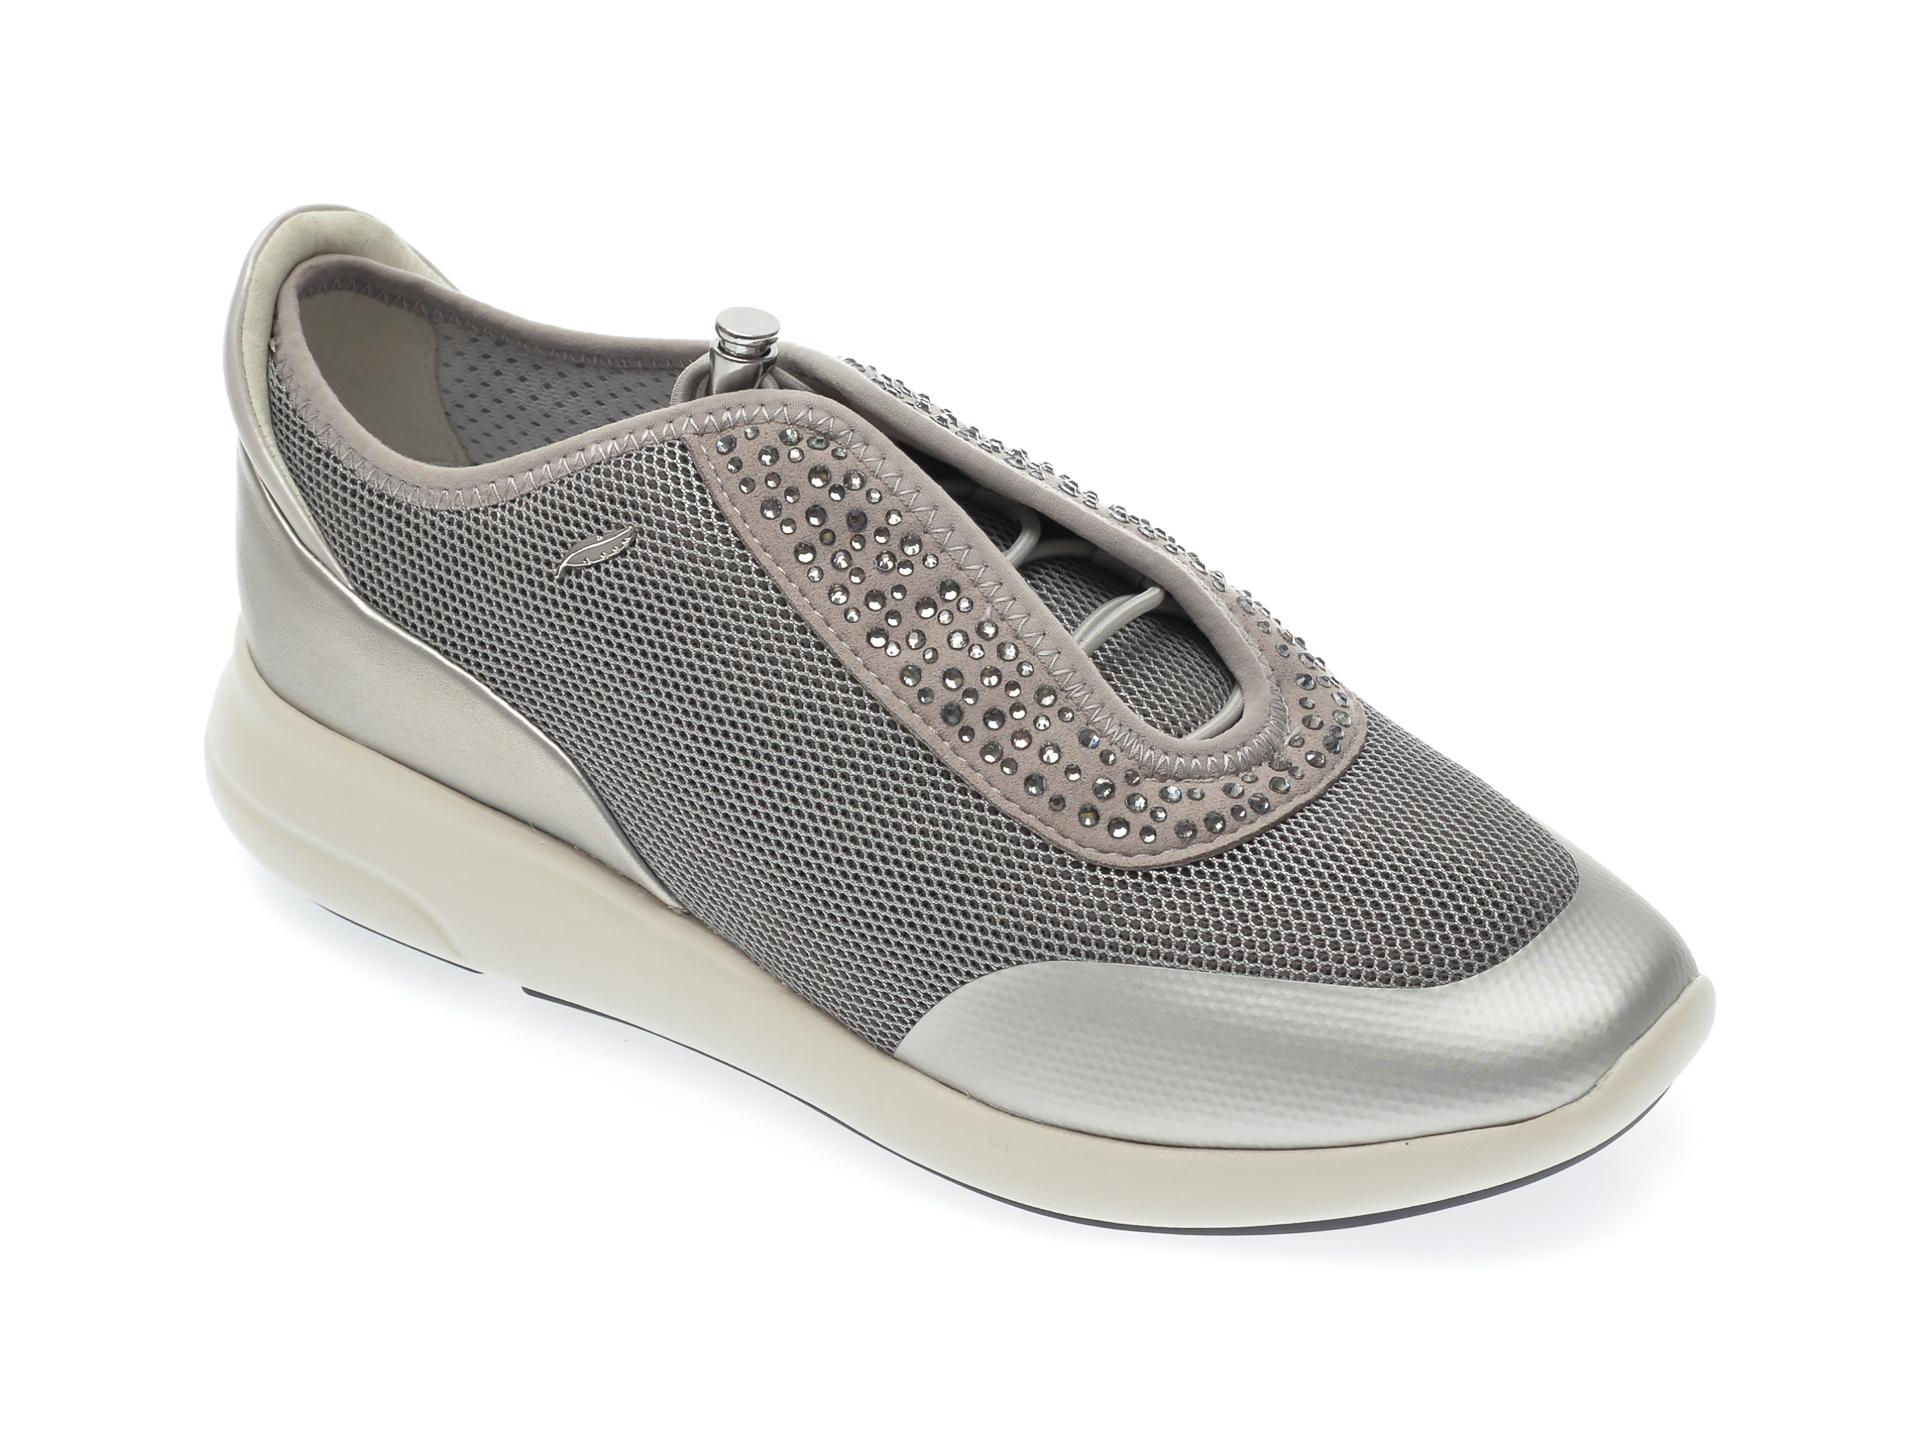 Pantofi sport GEOX gri, D621CE, din material textil si piele ecologica New